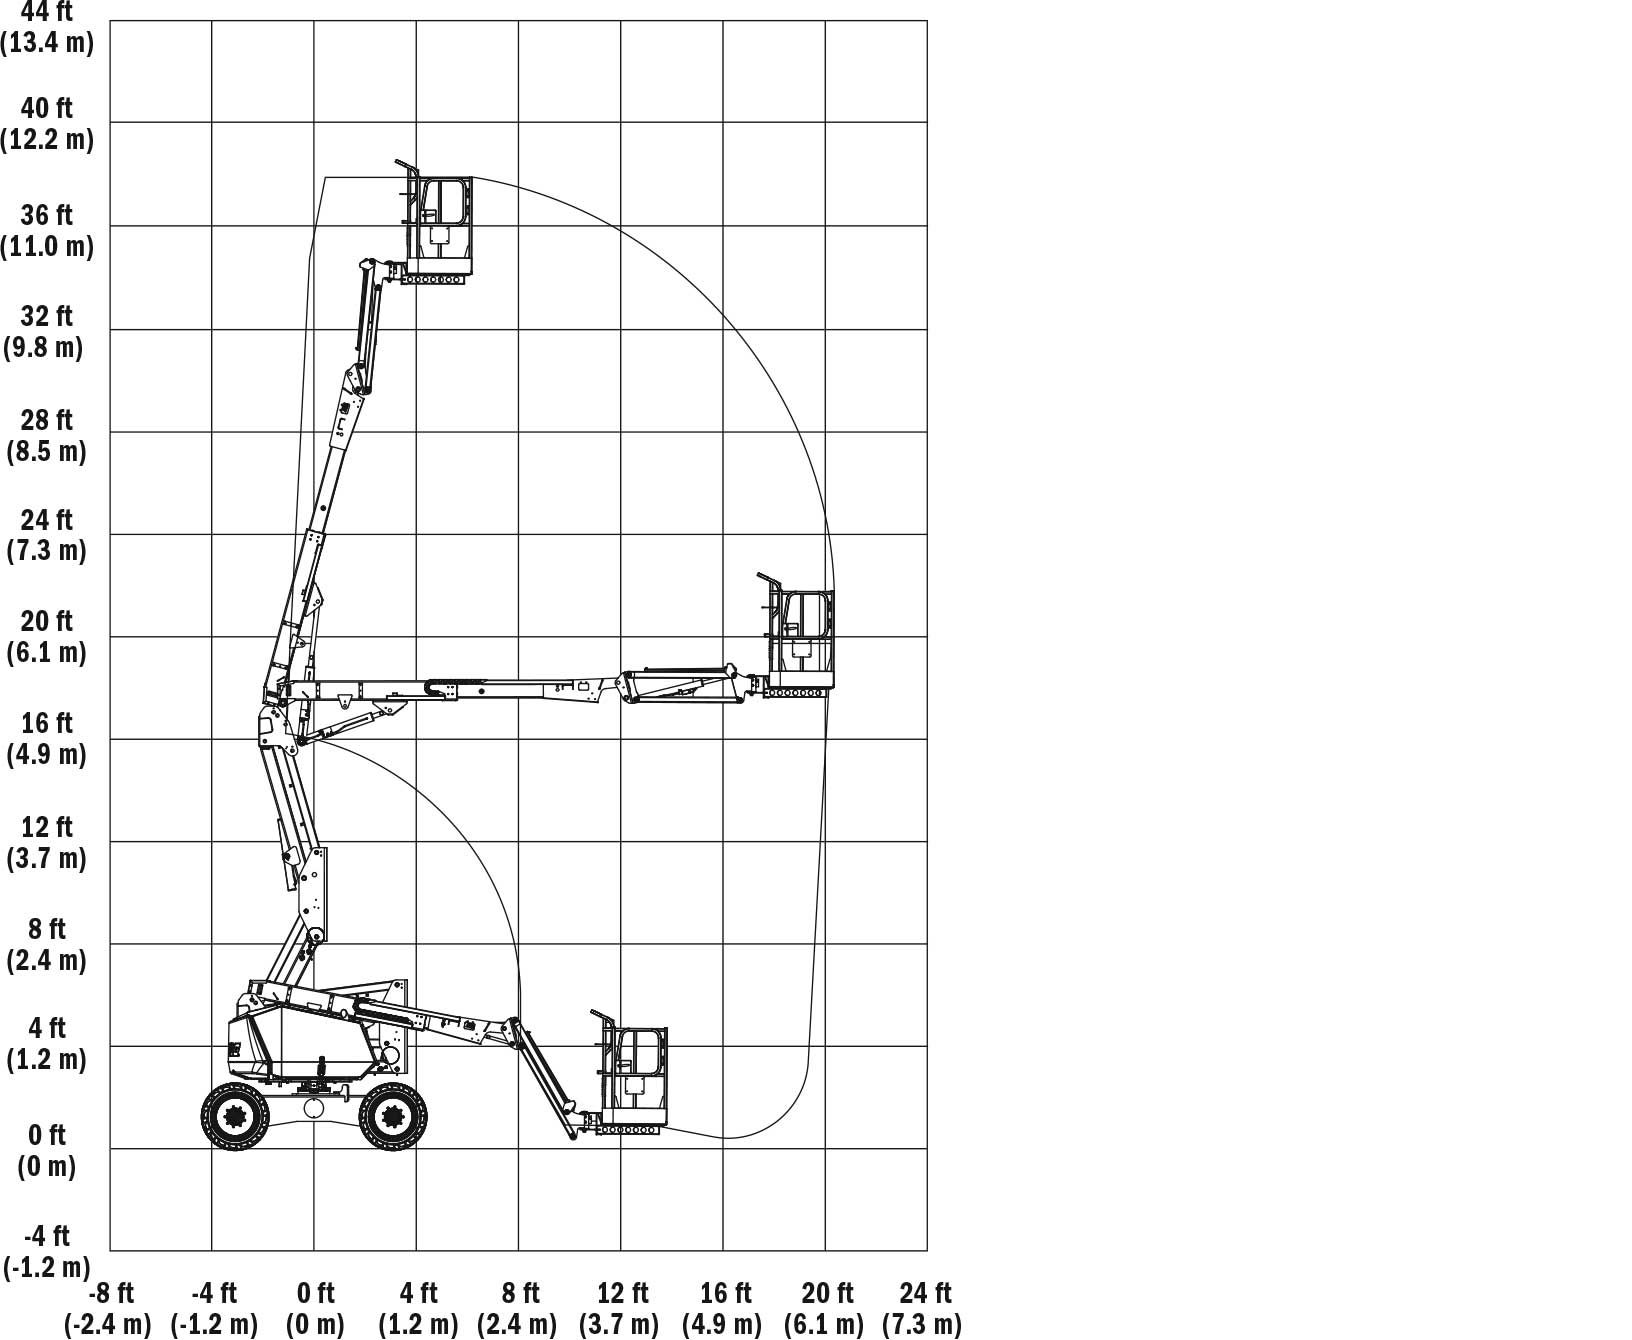 JLG 340AJ Articulating Boom Lift Reach Diagram